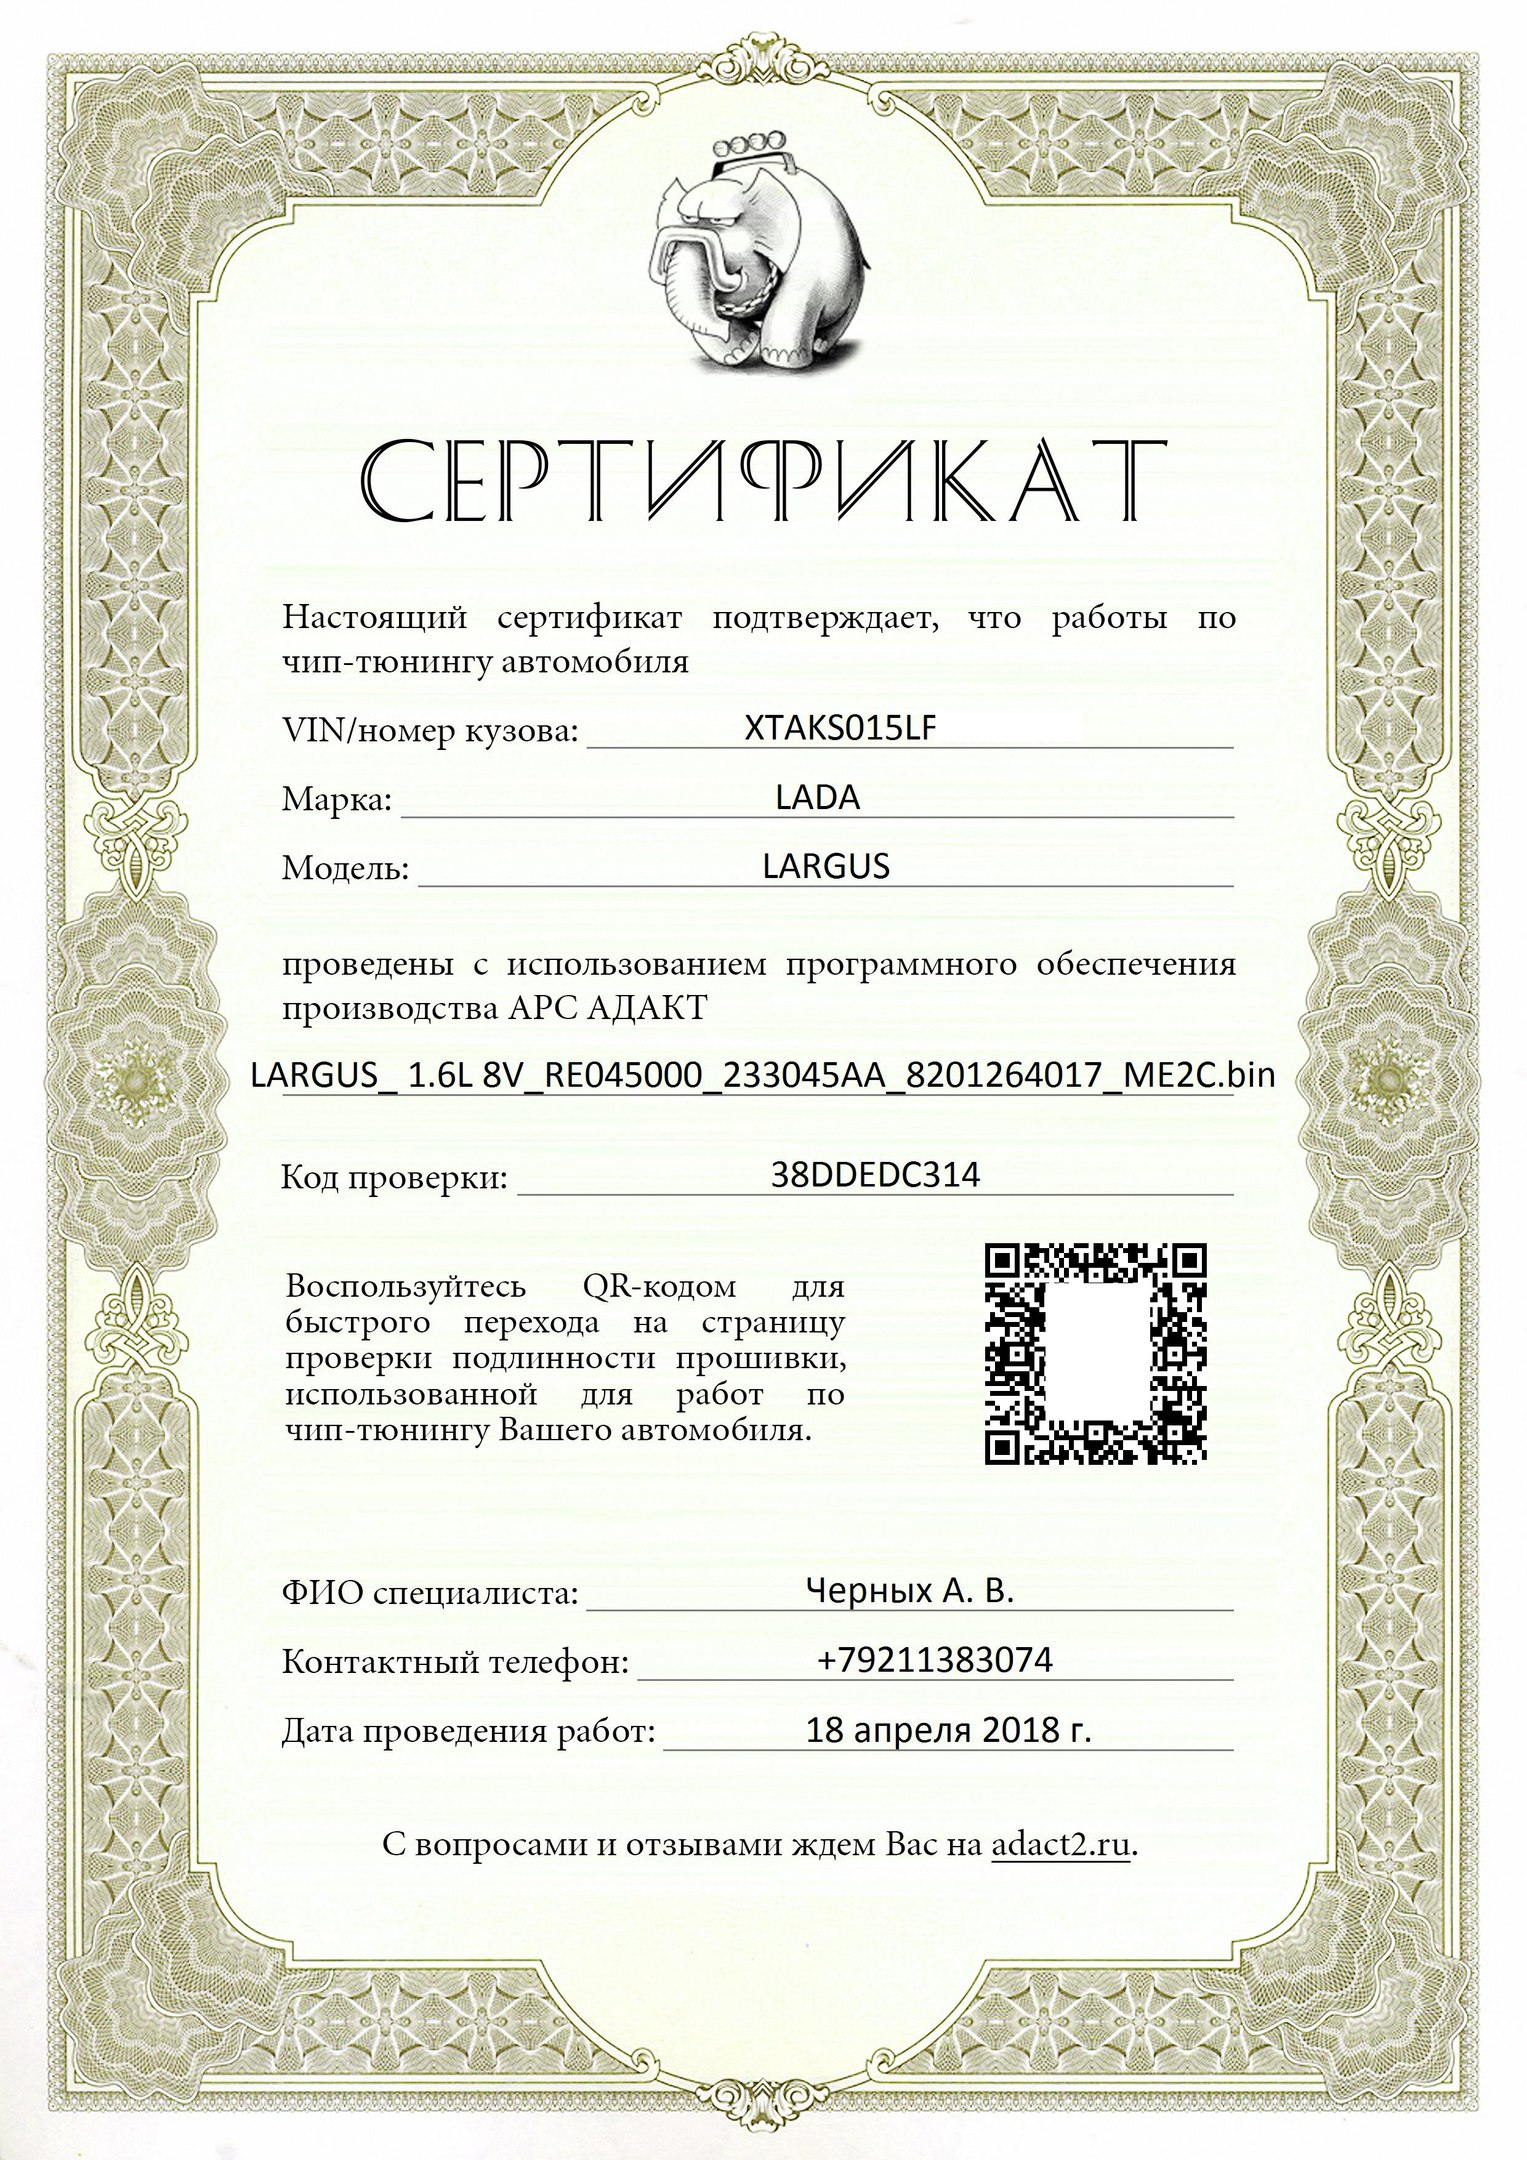 https://pp.userapi.com/c834301/v834301682/12cff2/RviUB377AUQ.jpg